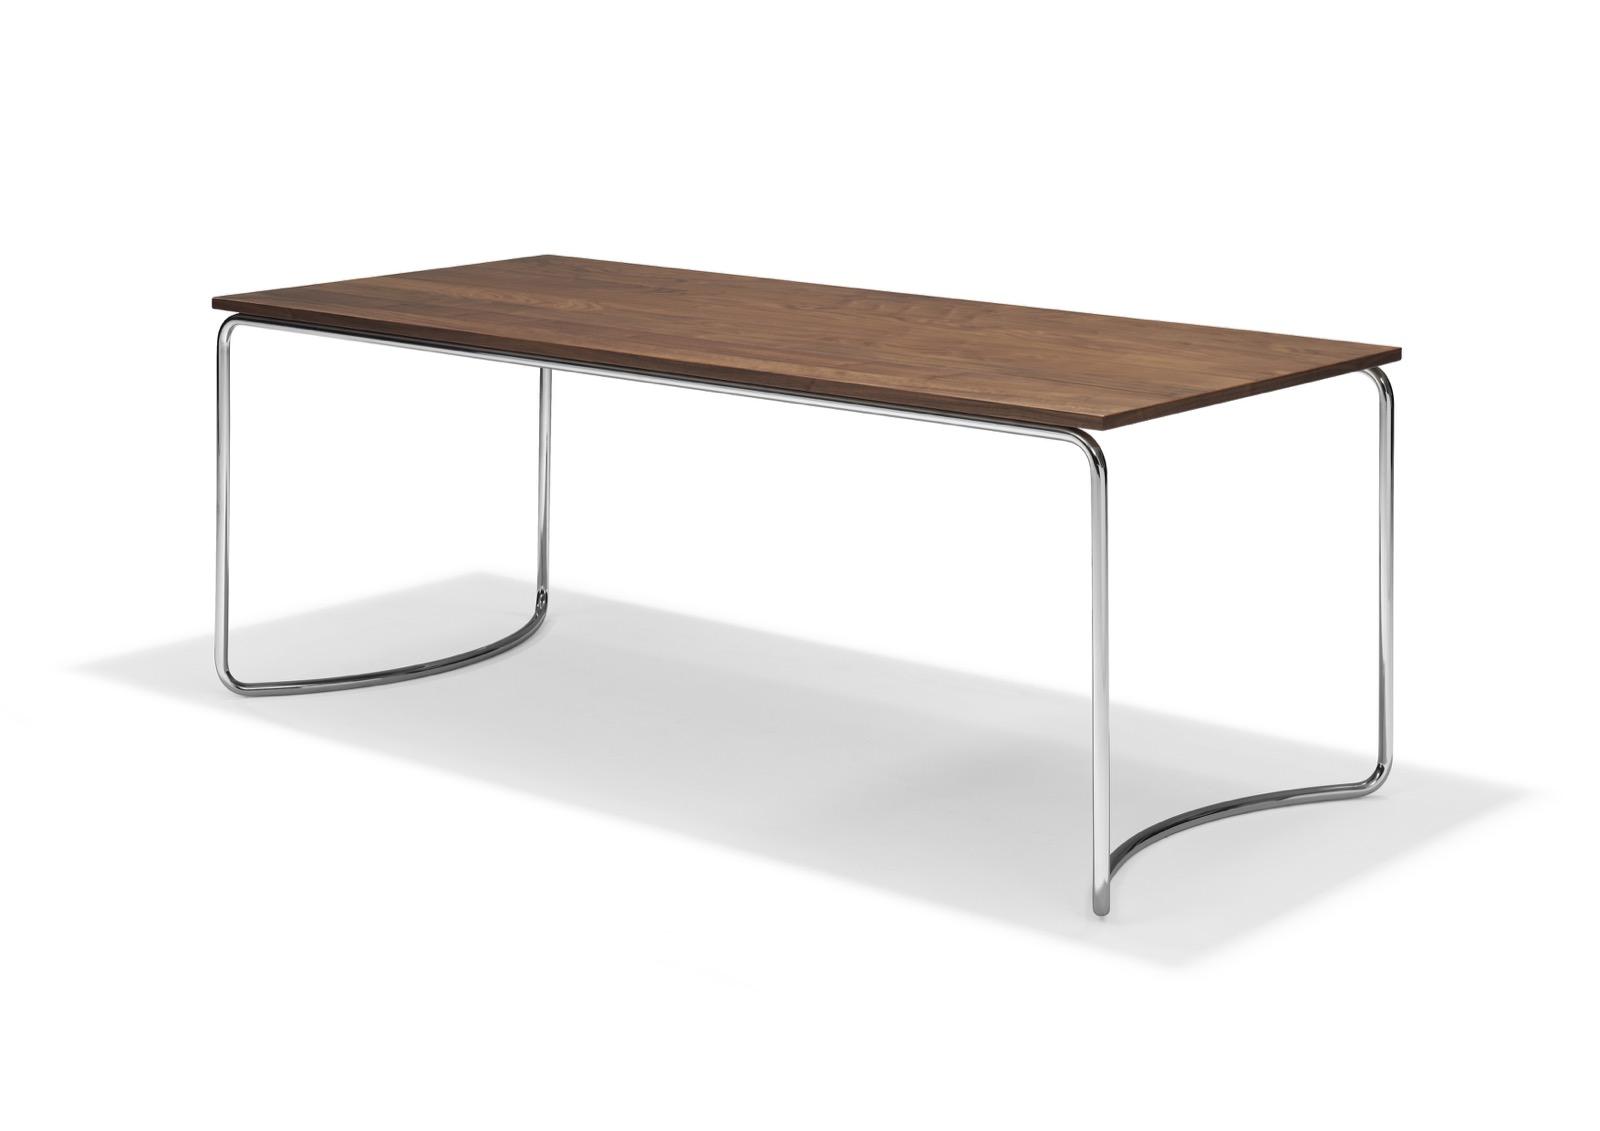 Dutch originals gispen gt1101 rh eetkamertafel matser wageningen - Eigentijdse bed tafel ...